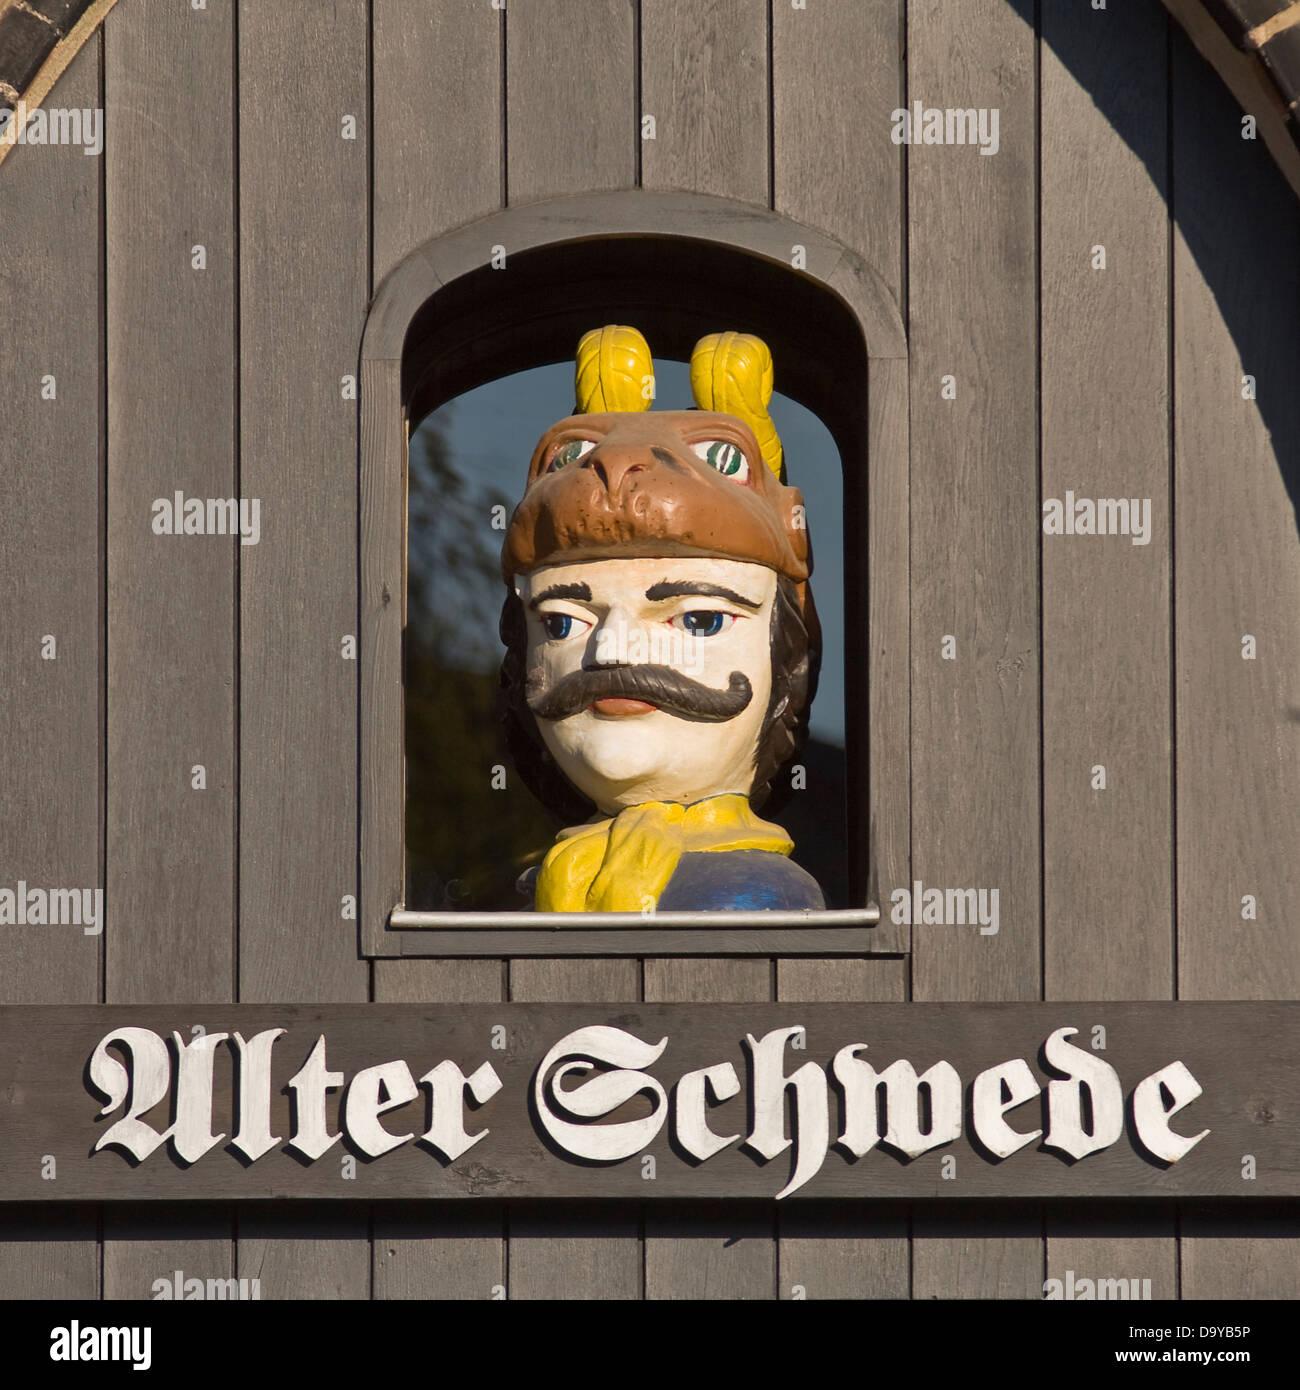 Europe, Germany, Mecklenburg-Western Pomerania, Wismar, Alter Schwede - Stock Image